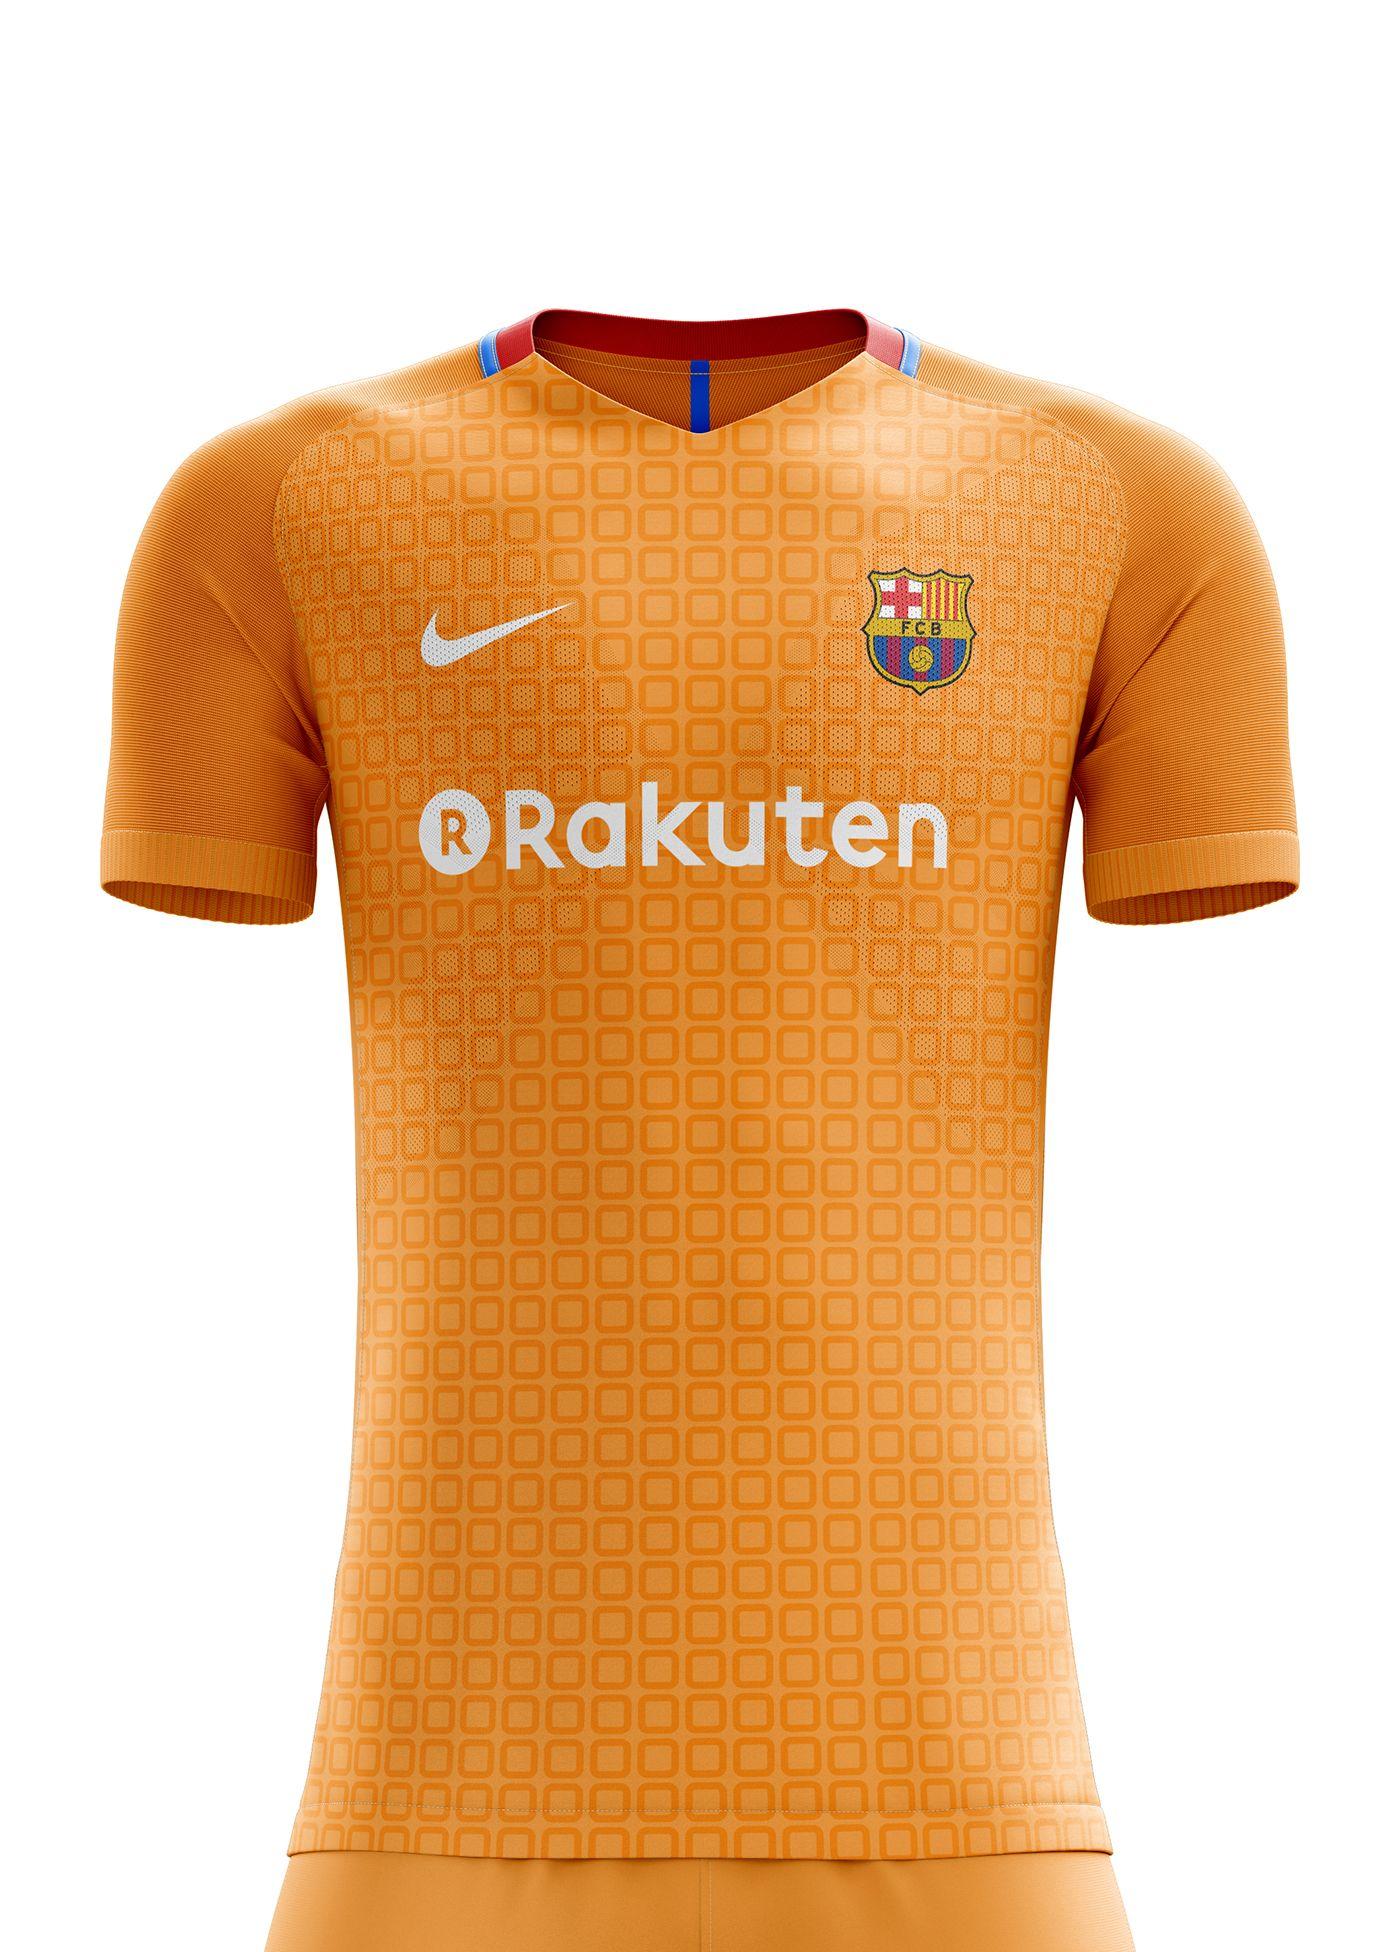 c3669dfc I designed football kits for FC Barcelona for the upcoming season 18/19. I